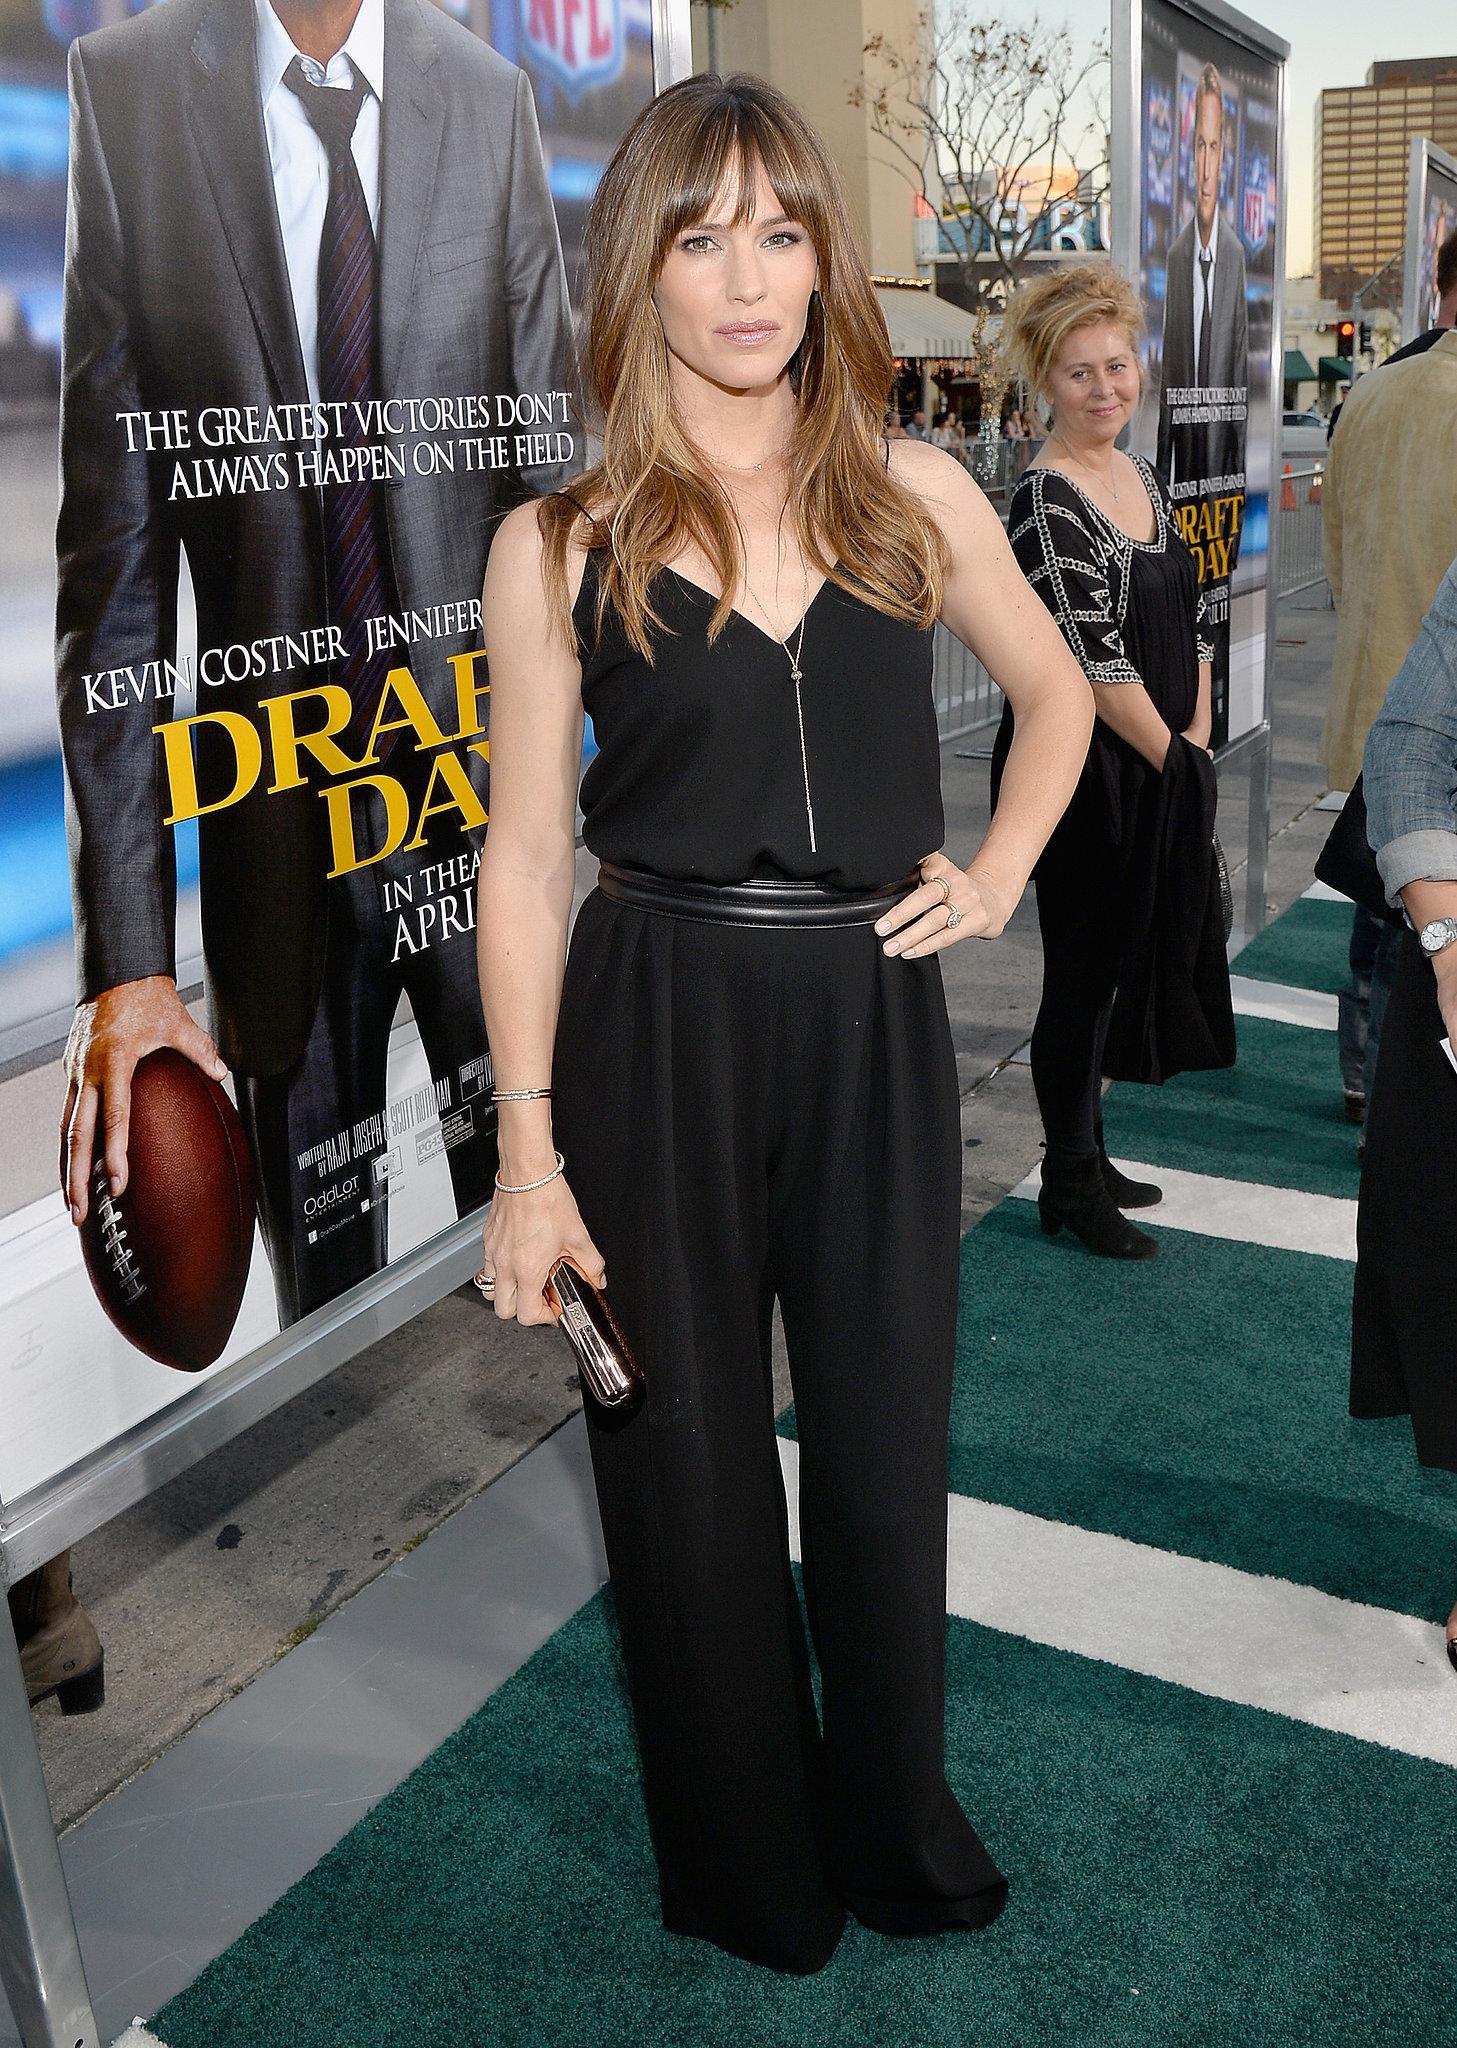 Jennifer Garner Brings Her A-Game to the Red Carpet